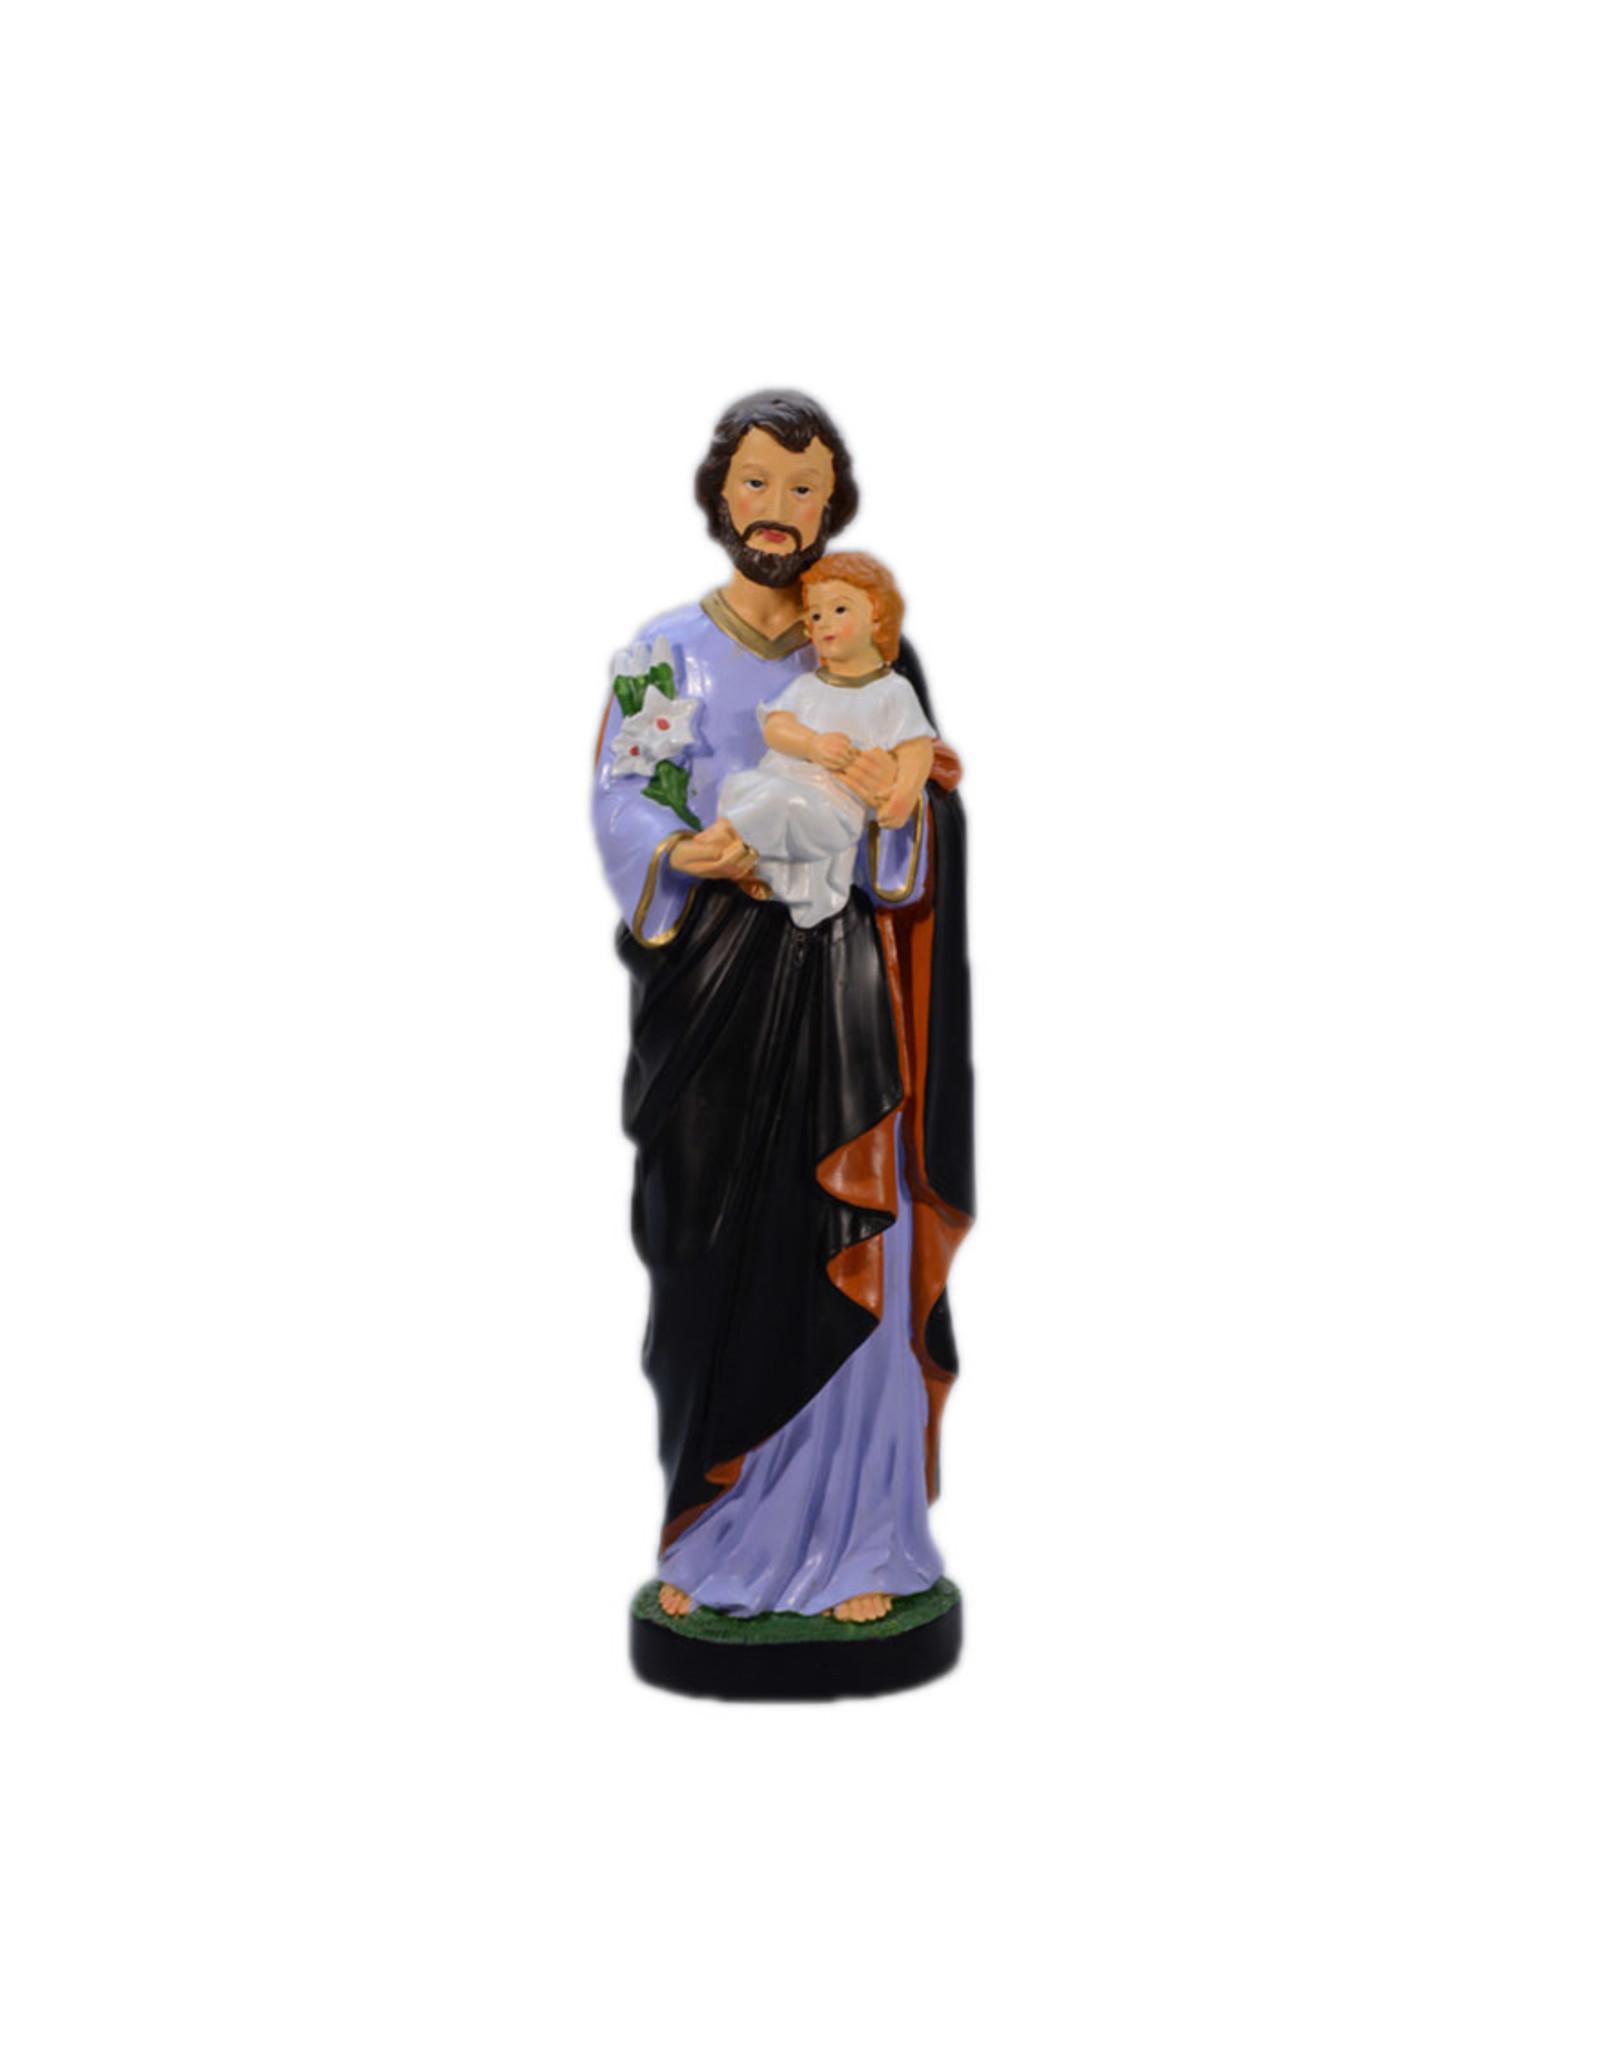 Statue of Saint Joseph and Child